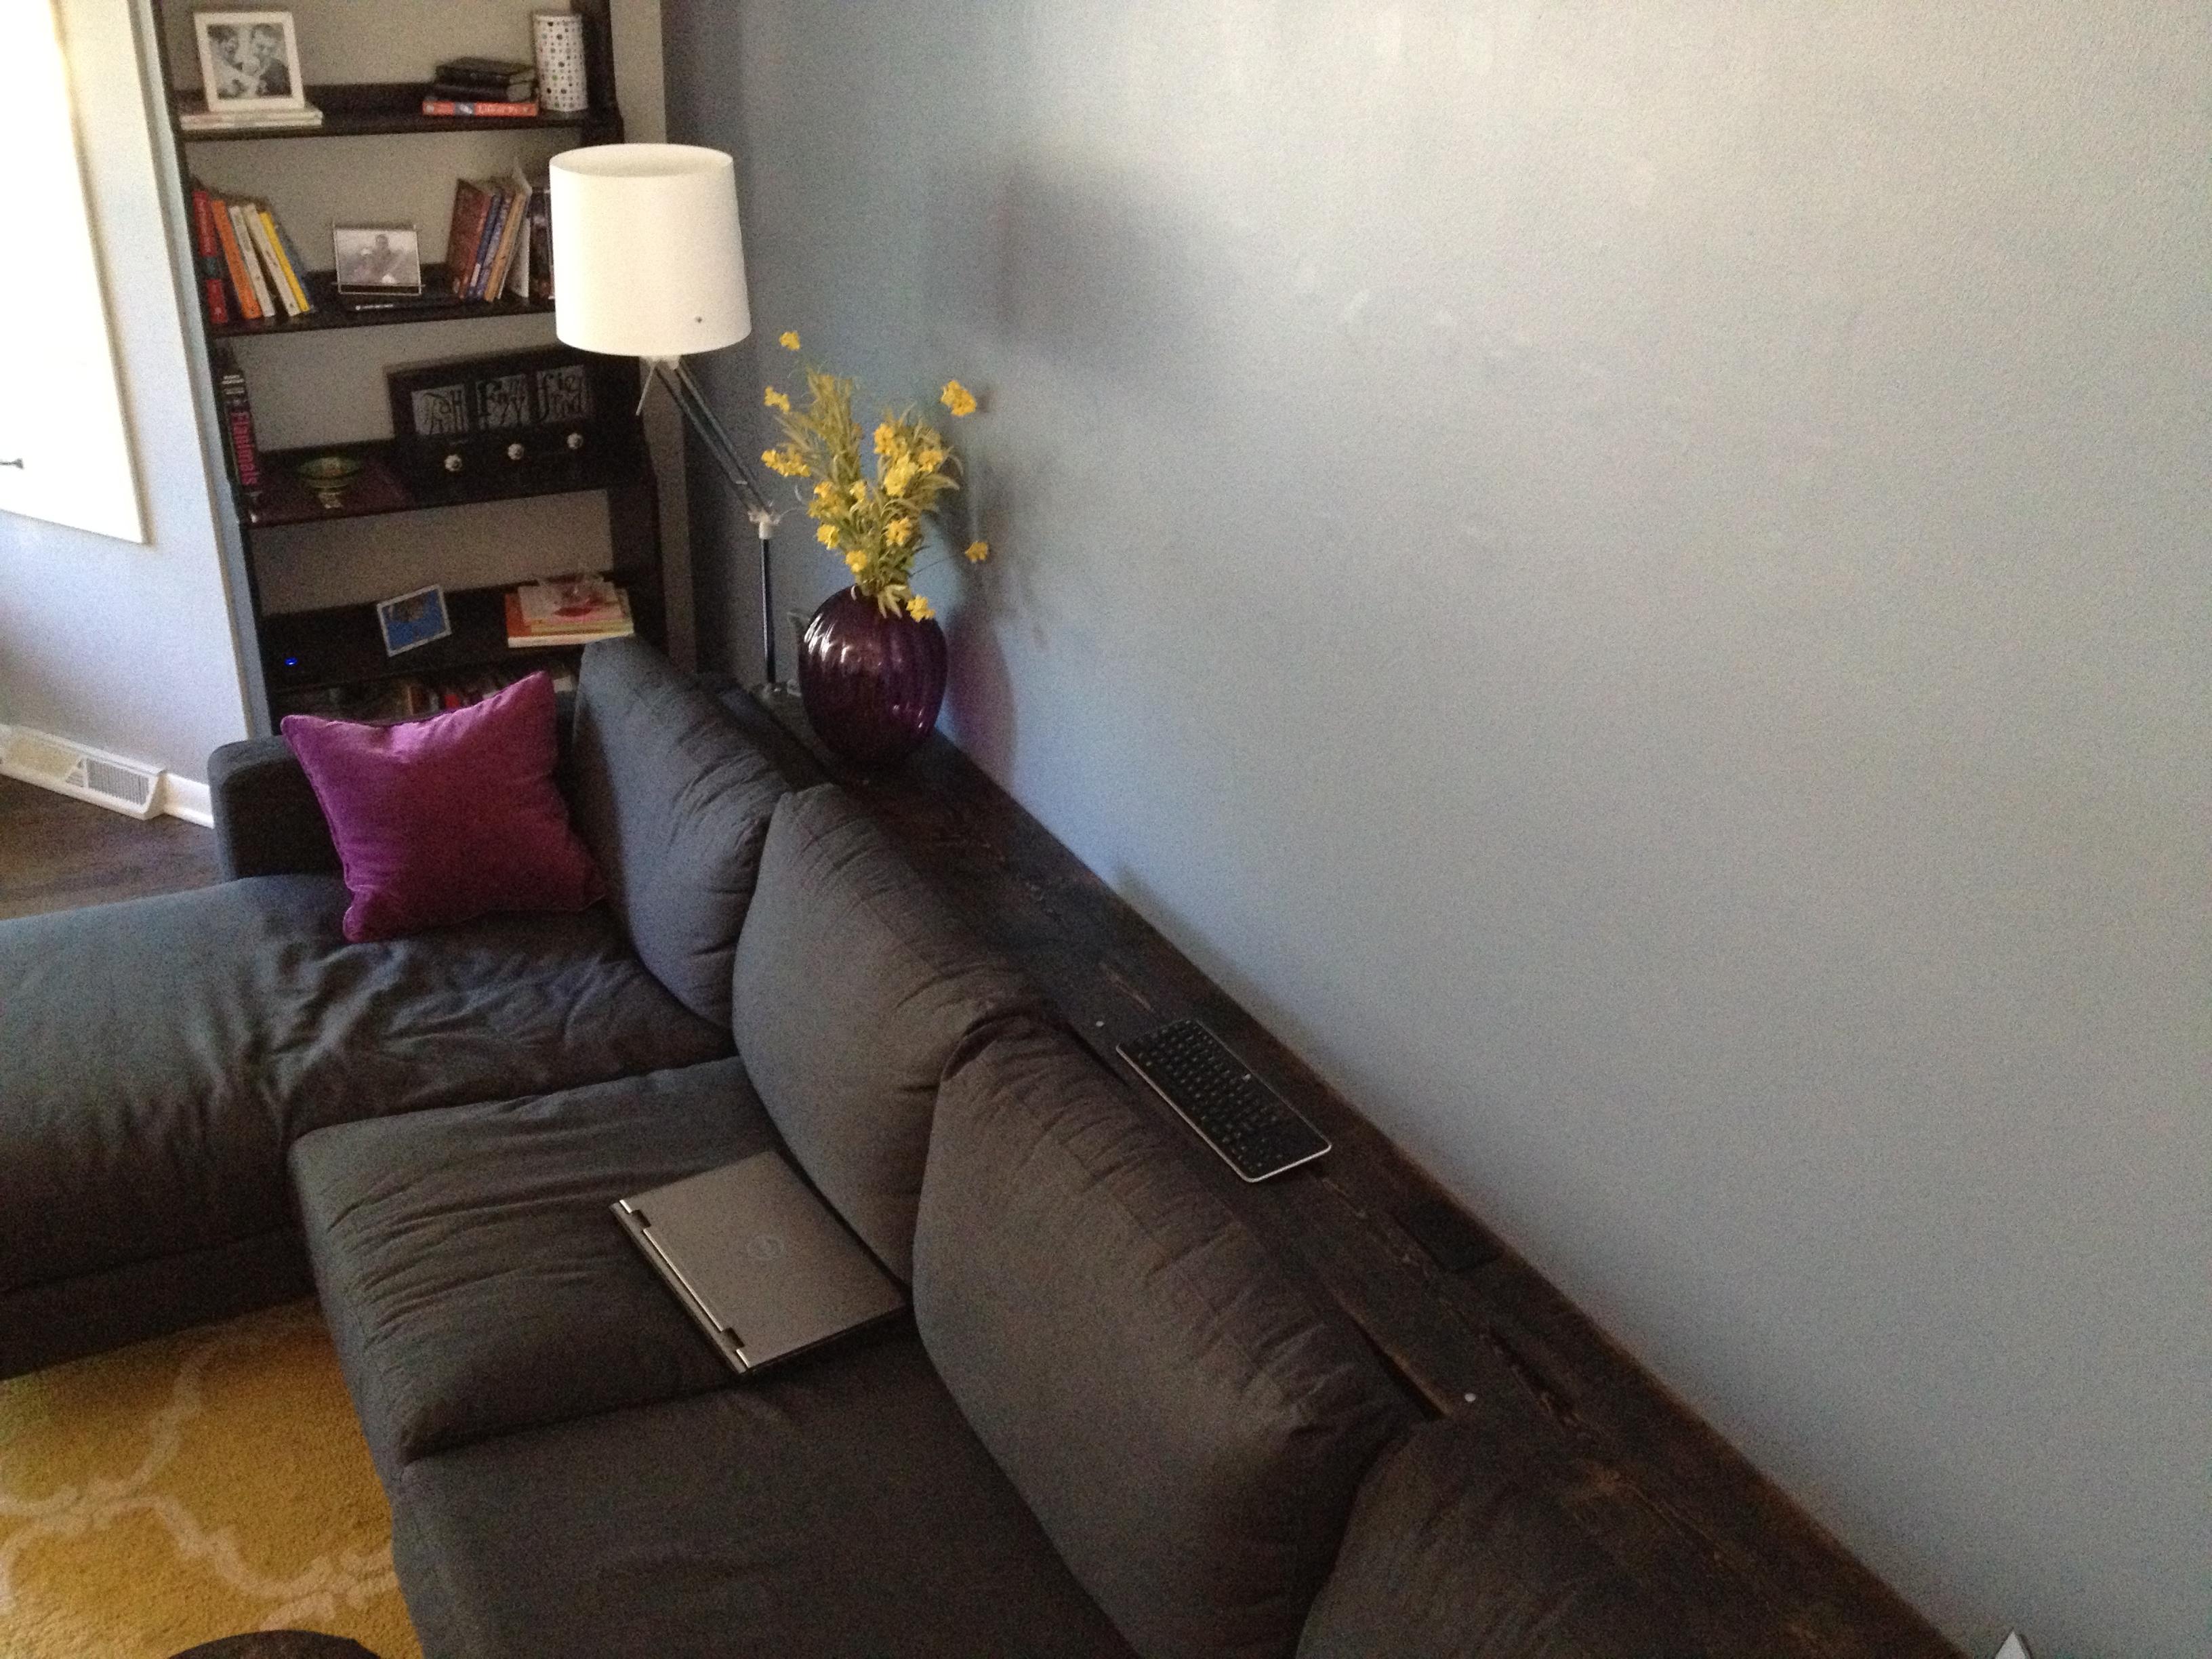 sofa (keepsonringing.files.wordpress.com)